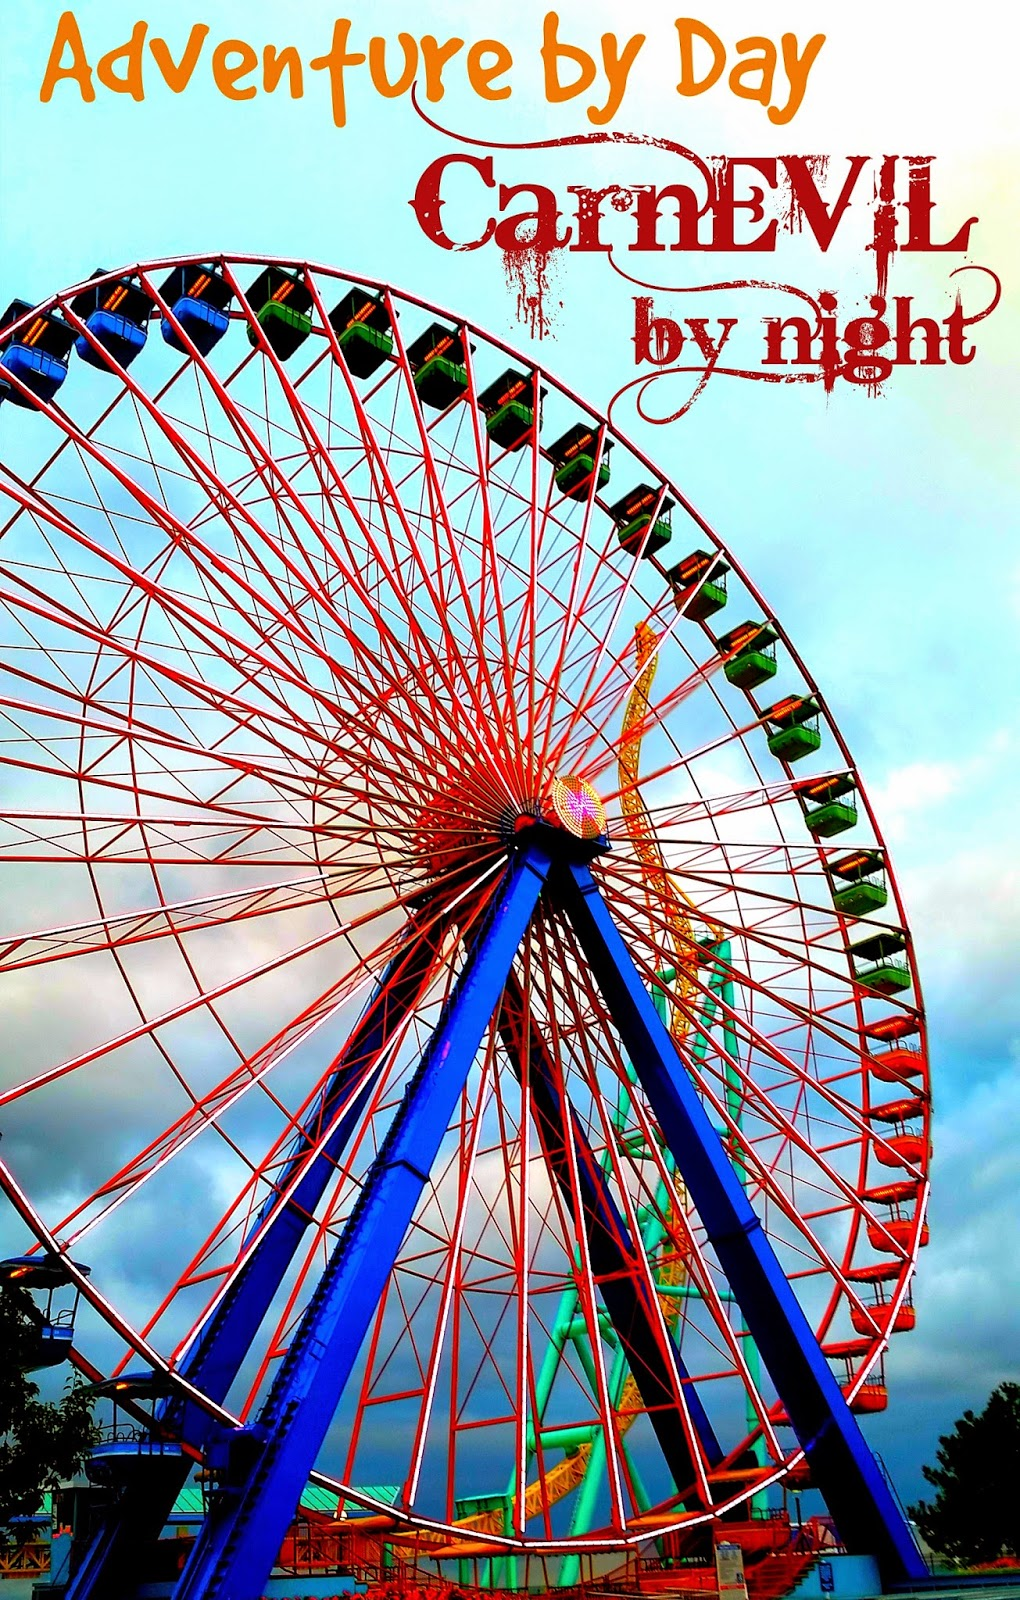 #ad Fun at Halloweekends Cedar Point